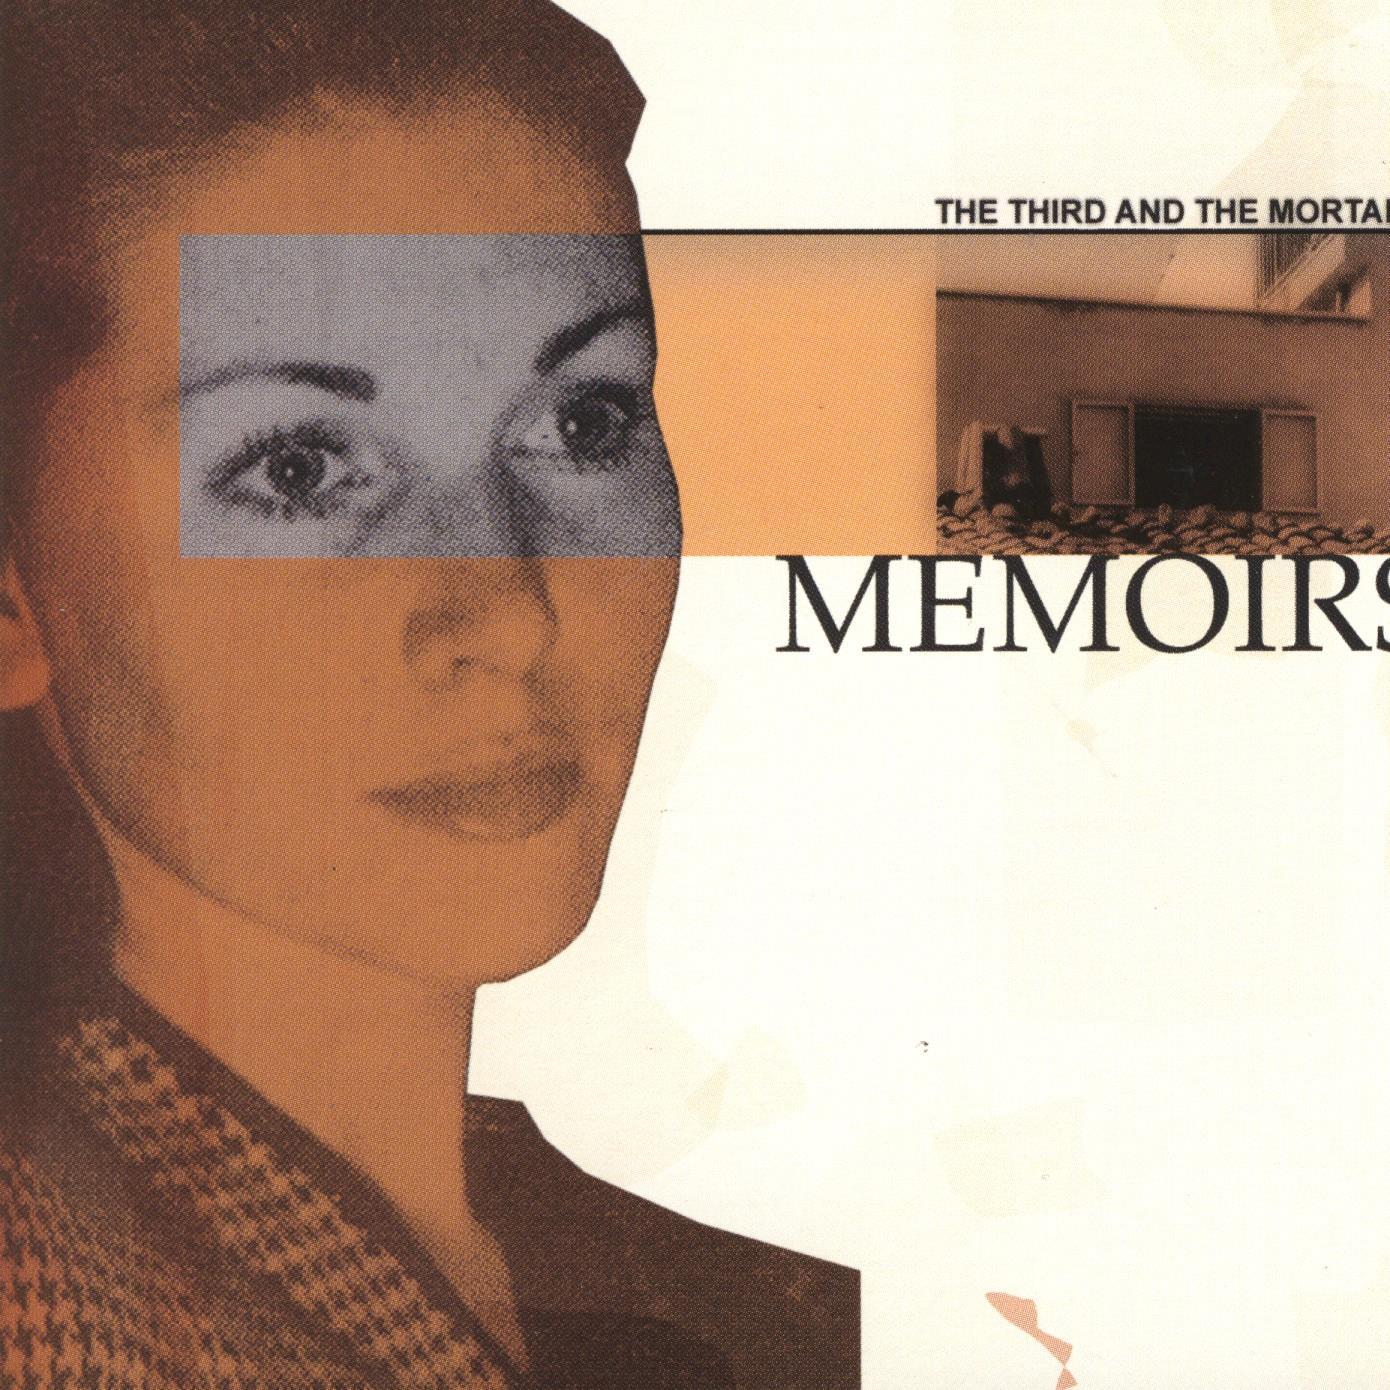 3rd And The Mortal - Memoirs [LTD LP]